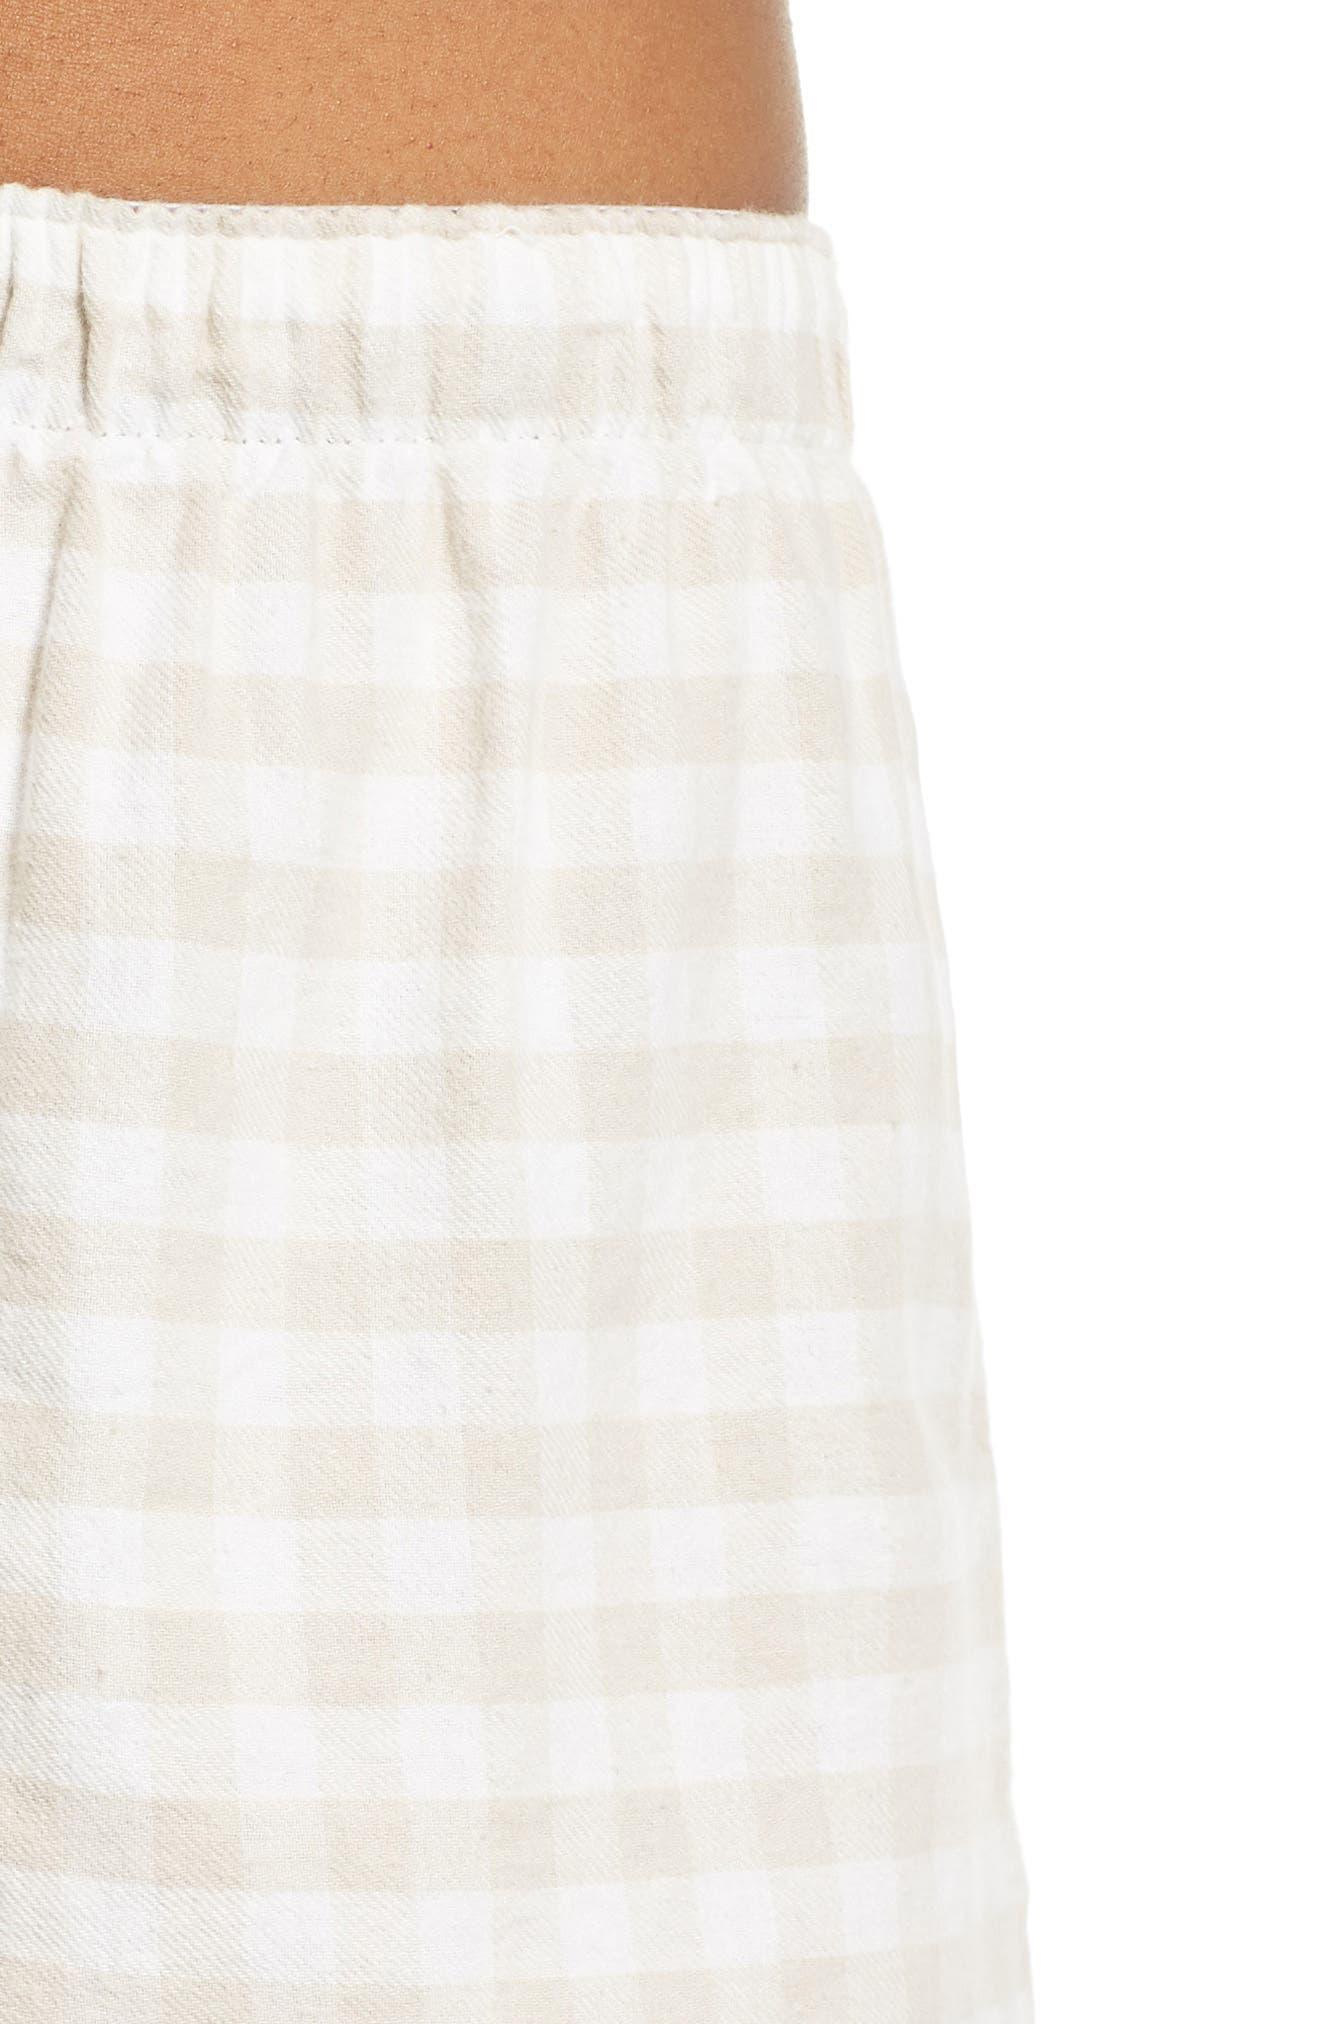 Gingham Pajama Shorts,                             Alternate thumbnail 4, color,                             CHAMPAGNE